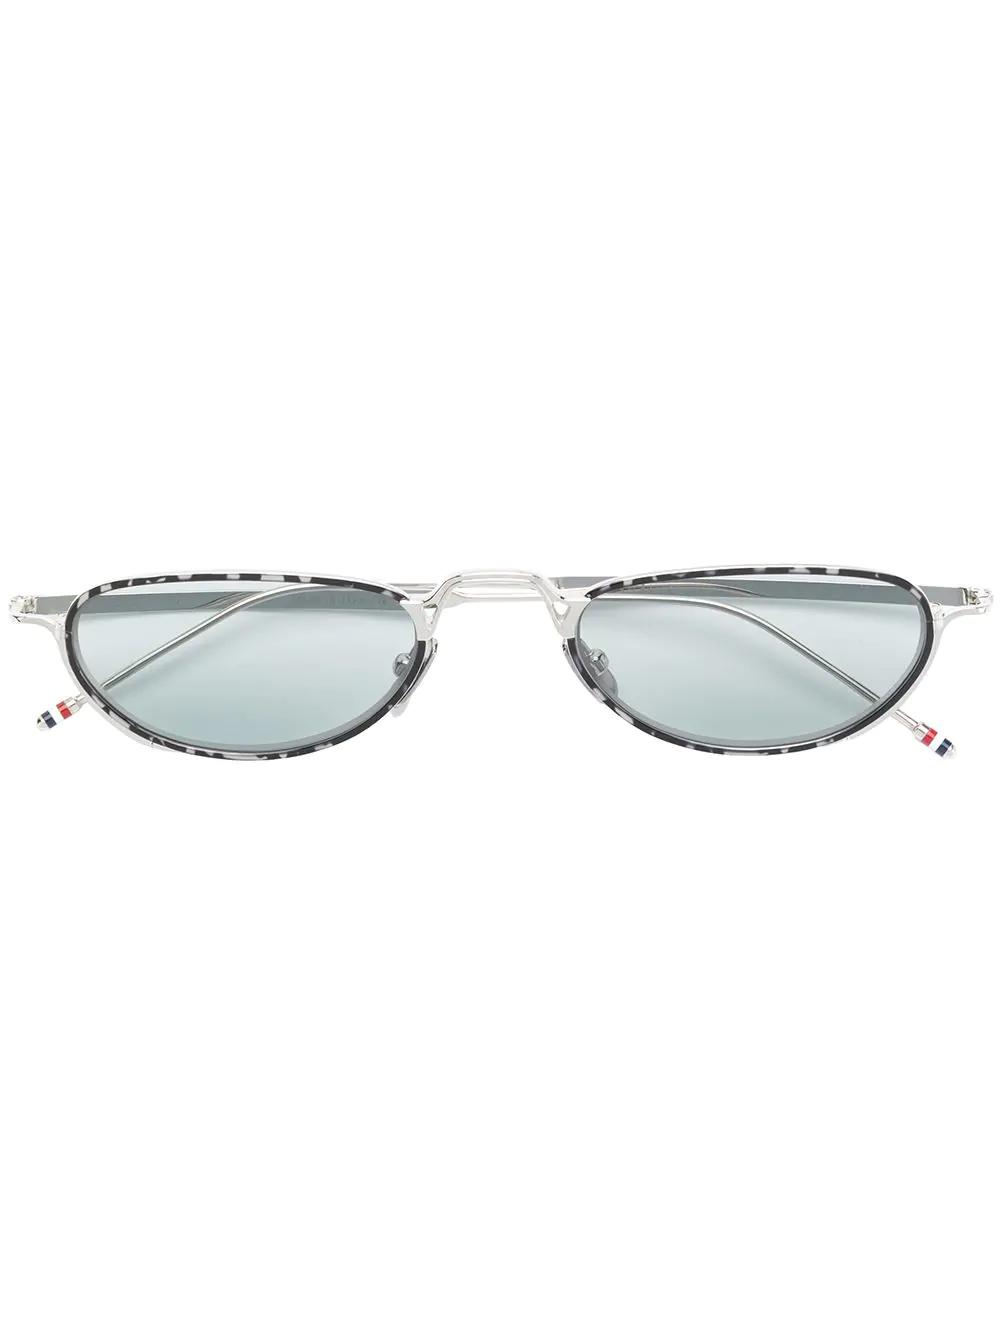 0c9c45969 Thom Browne Eyewear Cat-Eye Tinted Sunglasses - Silver | ModeSens